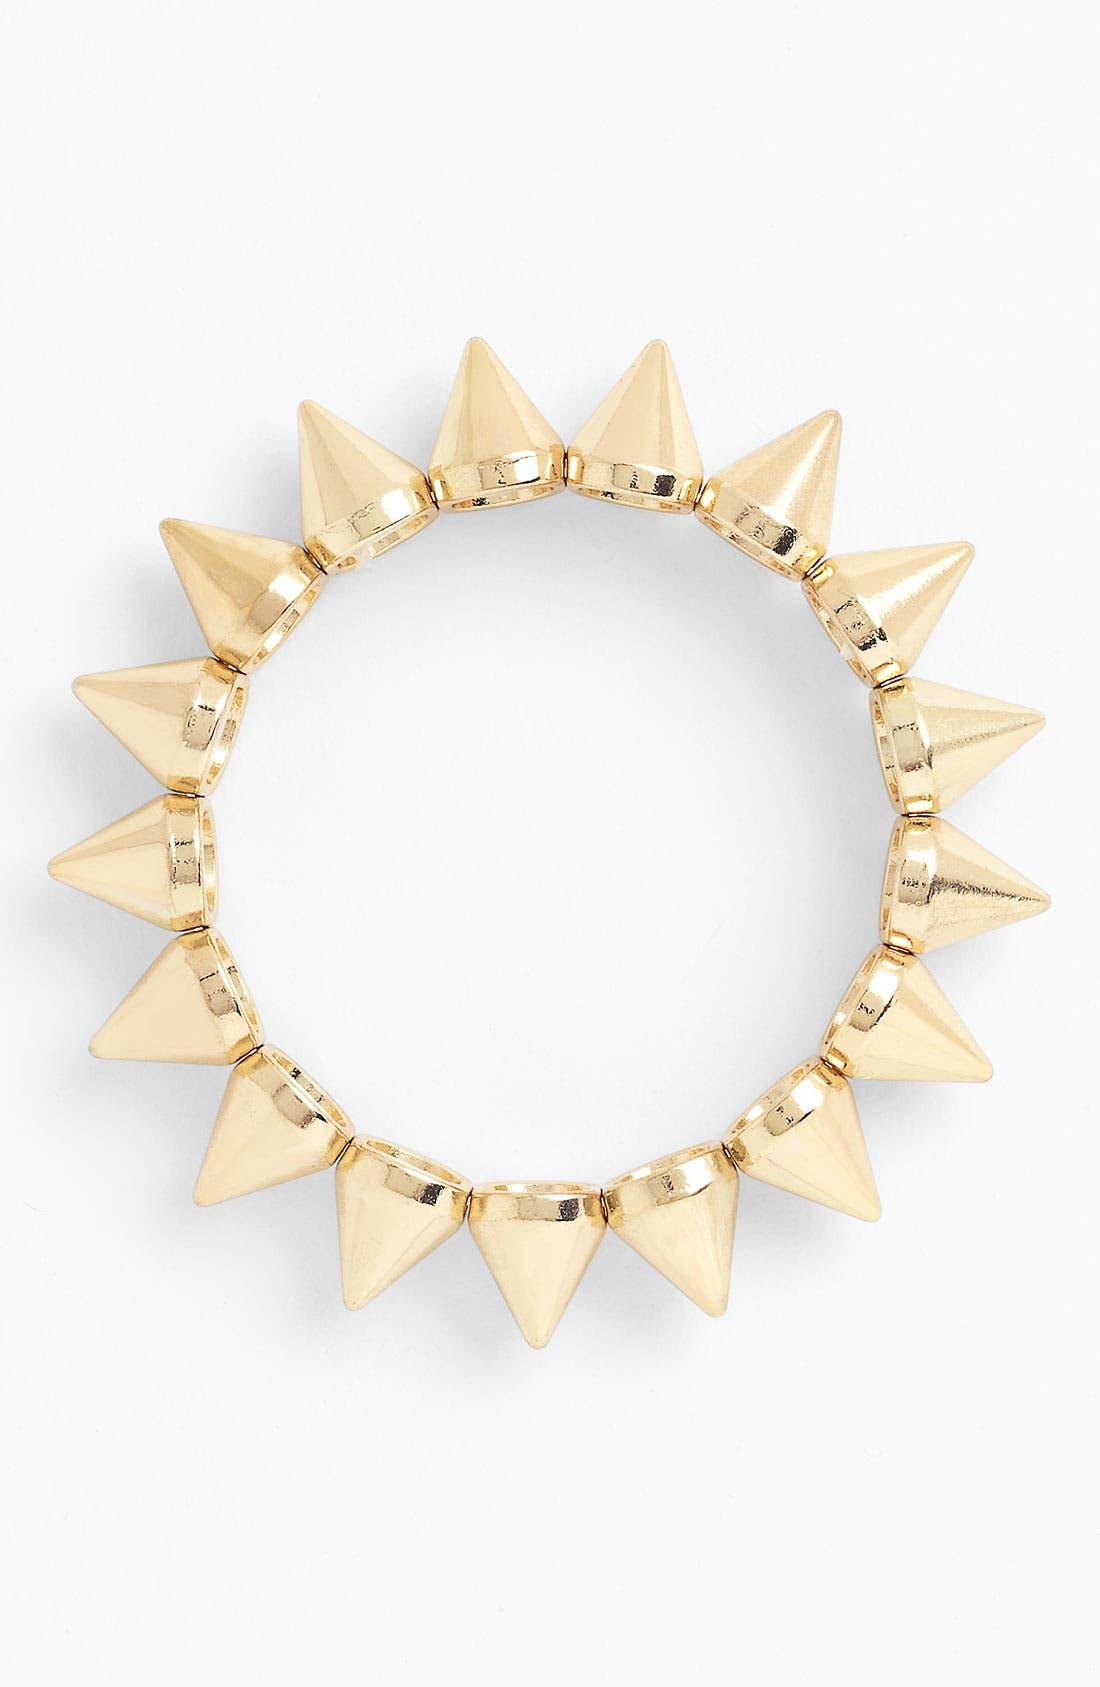 Alternate Image 1 Selected - Carole Spike Bracelet (Online Exclusive)